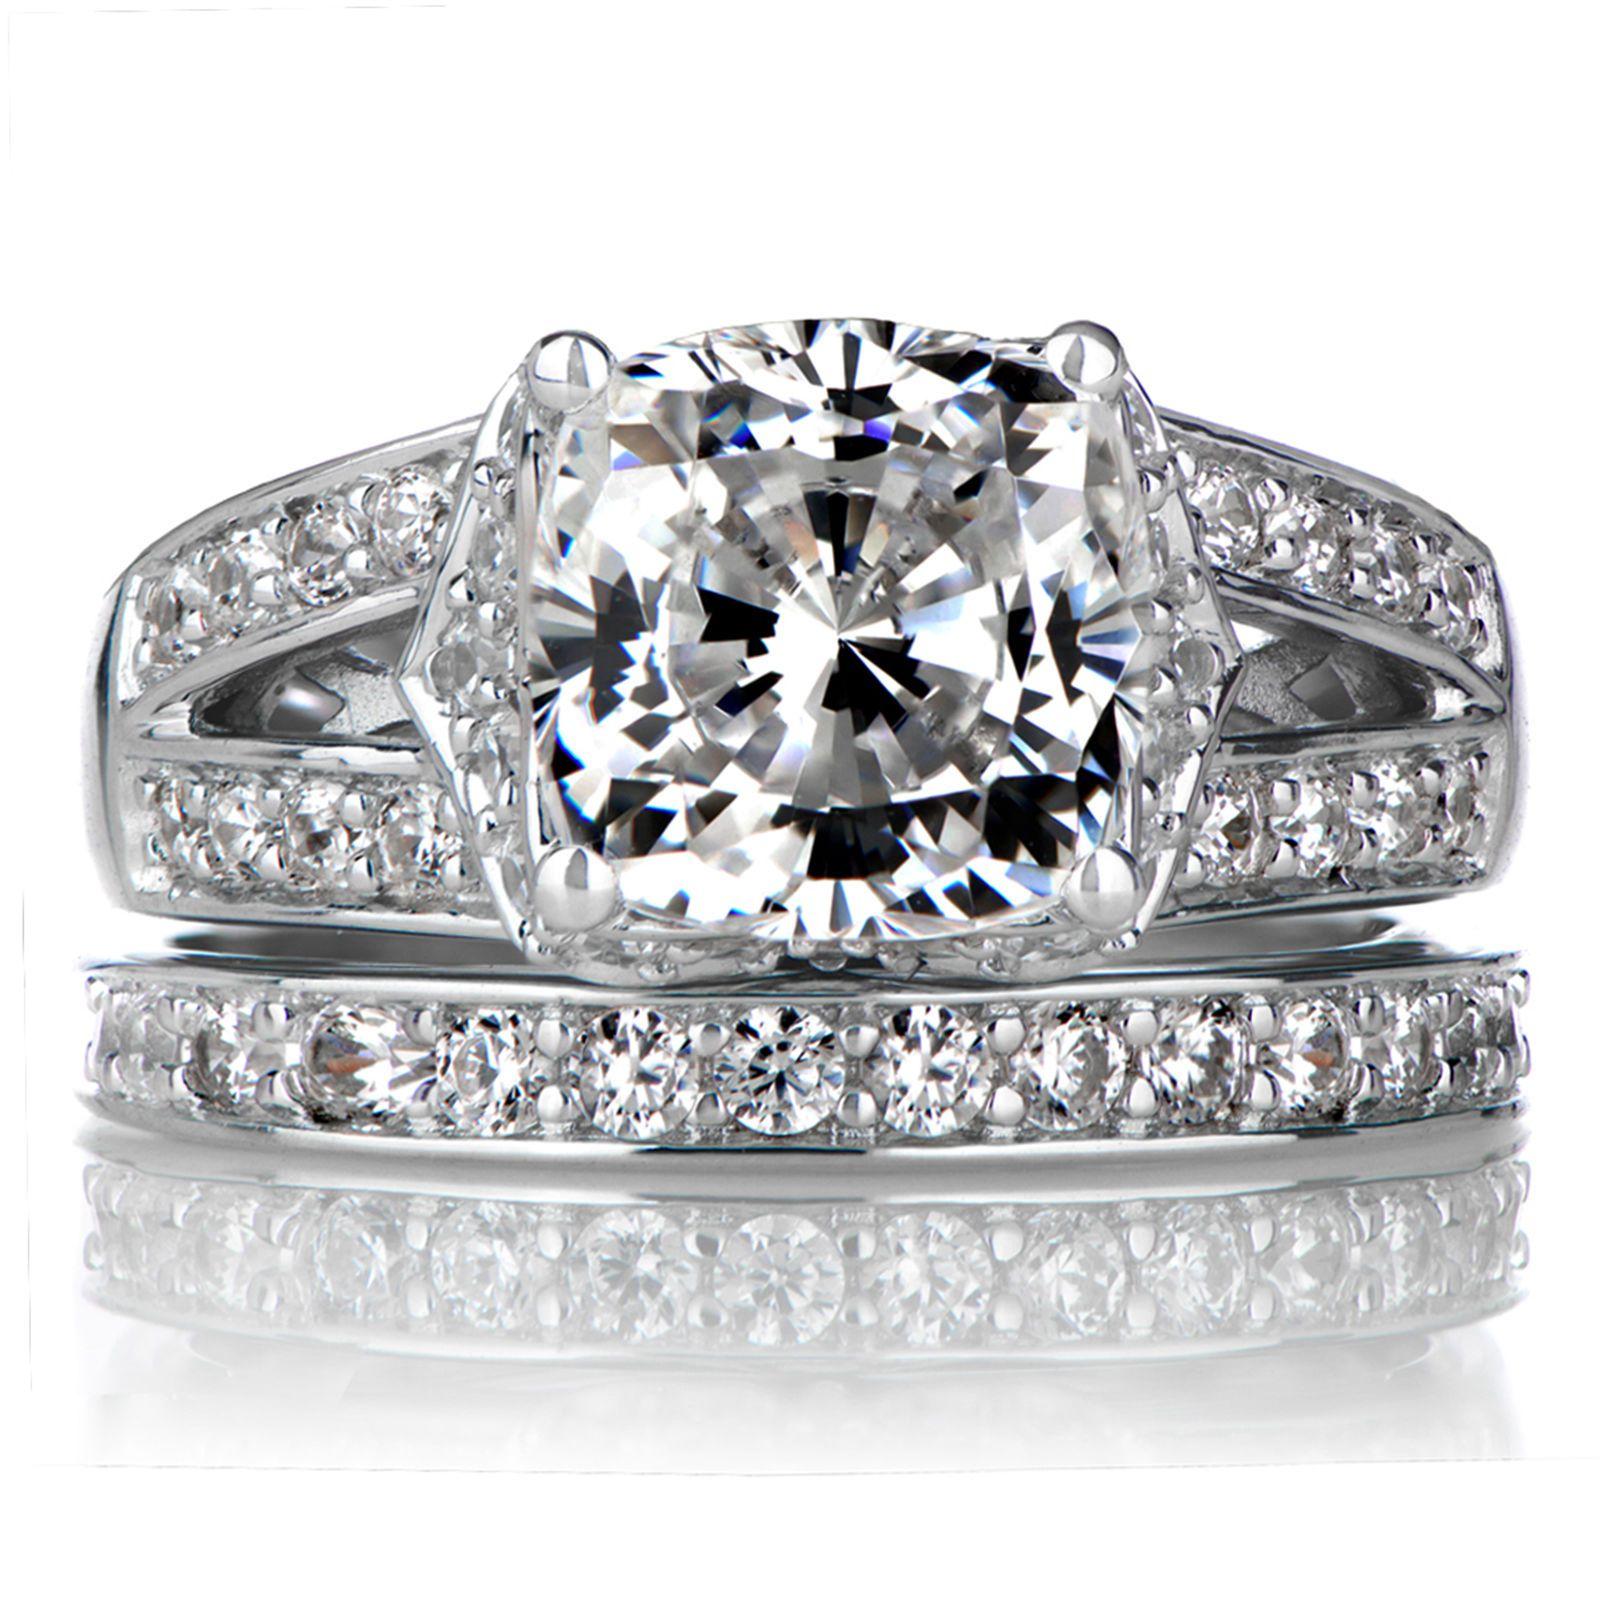 18K White Gold Diamond Band Size 4 5 6 7 2.70 Ct Diamond